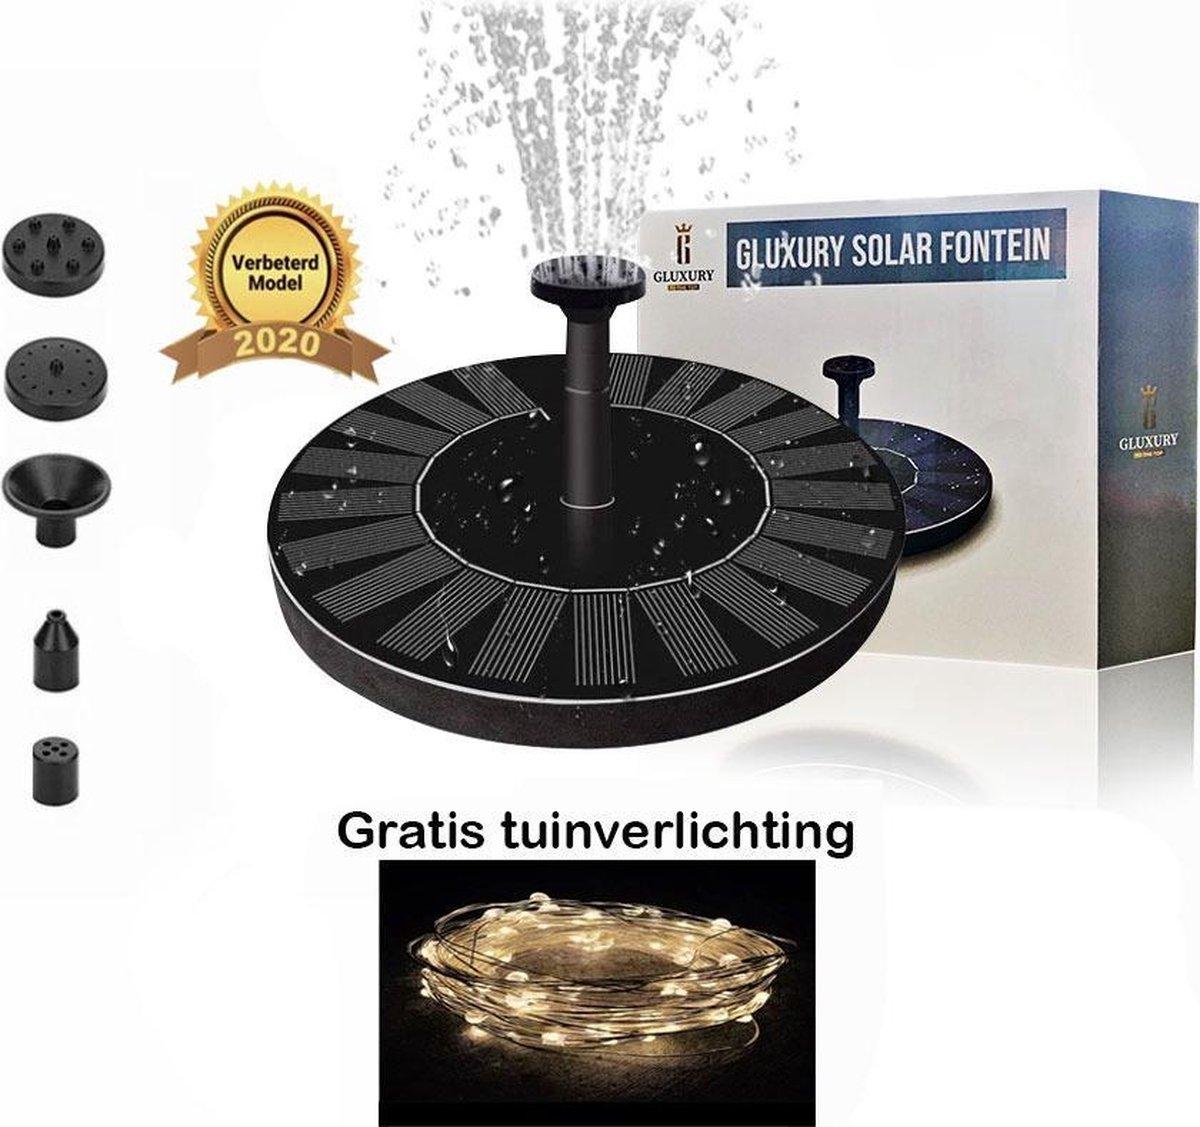 Solar Fontein op Zonne Energie + Gratis tuinverlichting - Extra Hoge Straal - Fontein pomp voor Tuin